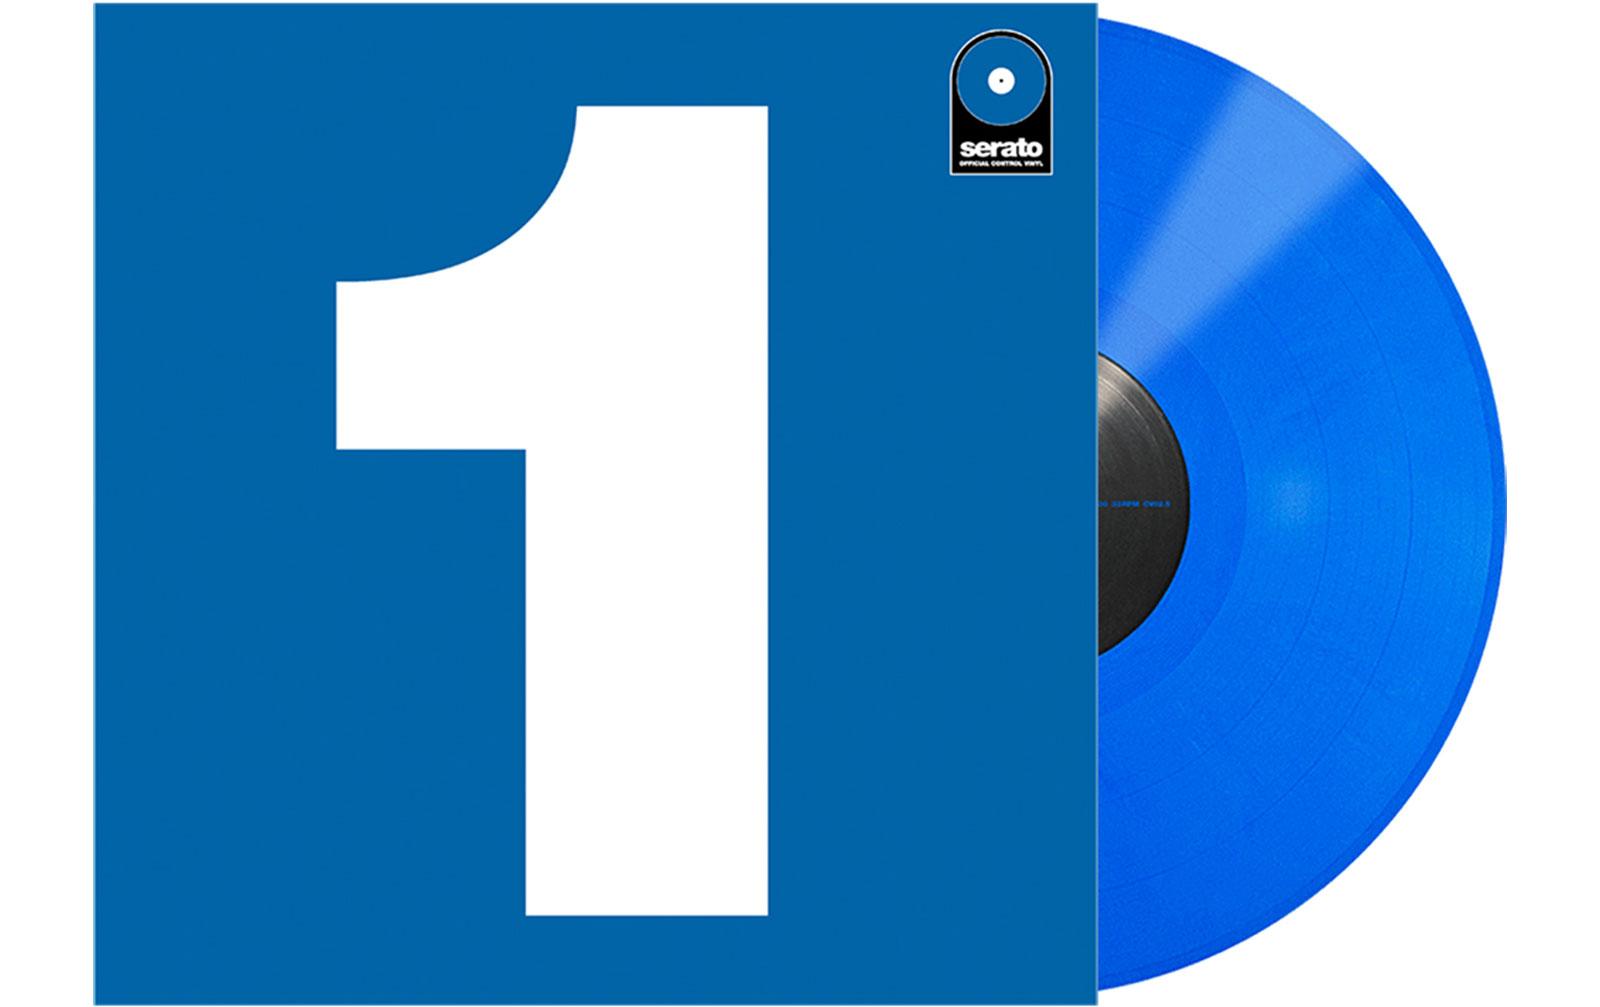 serato-12-single-control-vinyl-blau-performance-serie-cv2-5